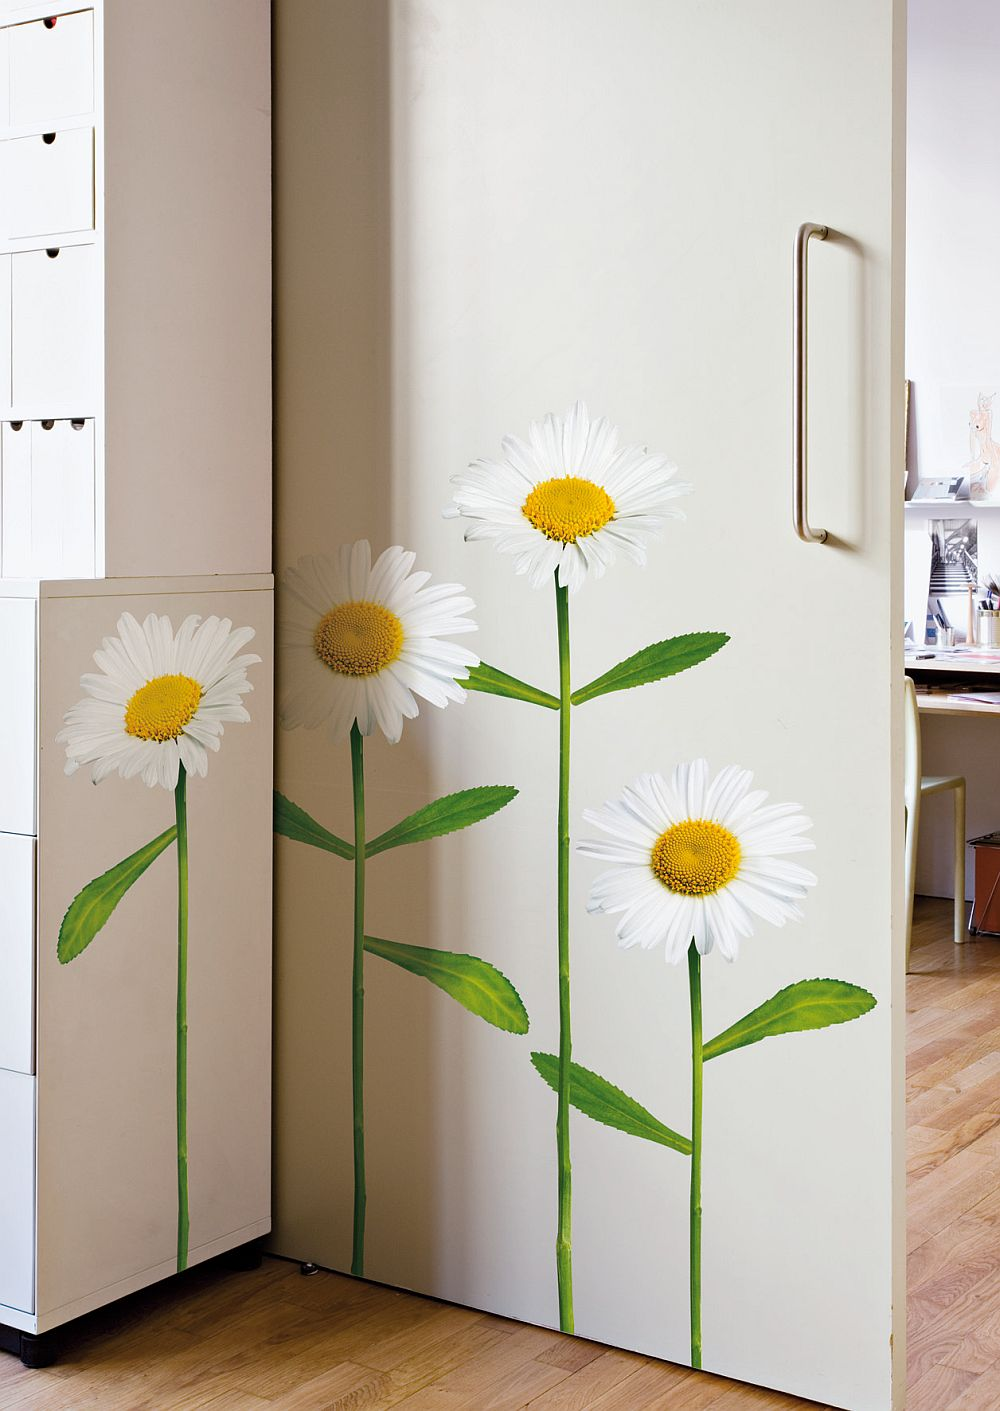 Stickere decorative arata excelent si pe mobila si pe usile interioare